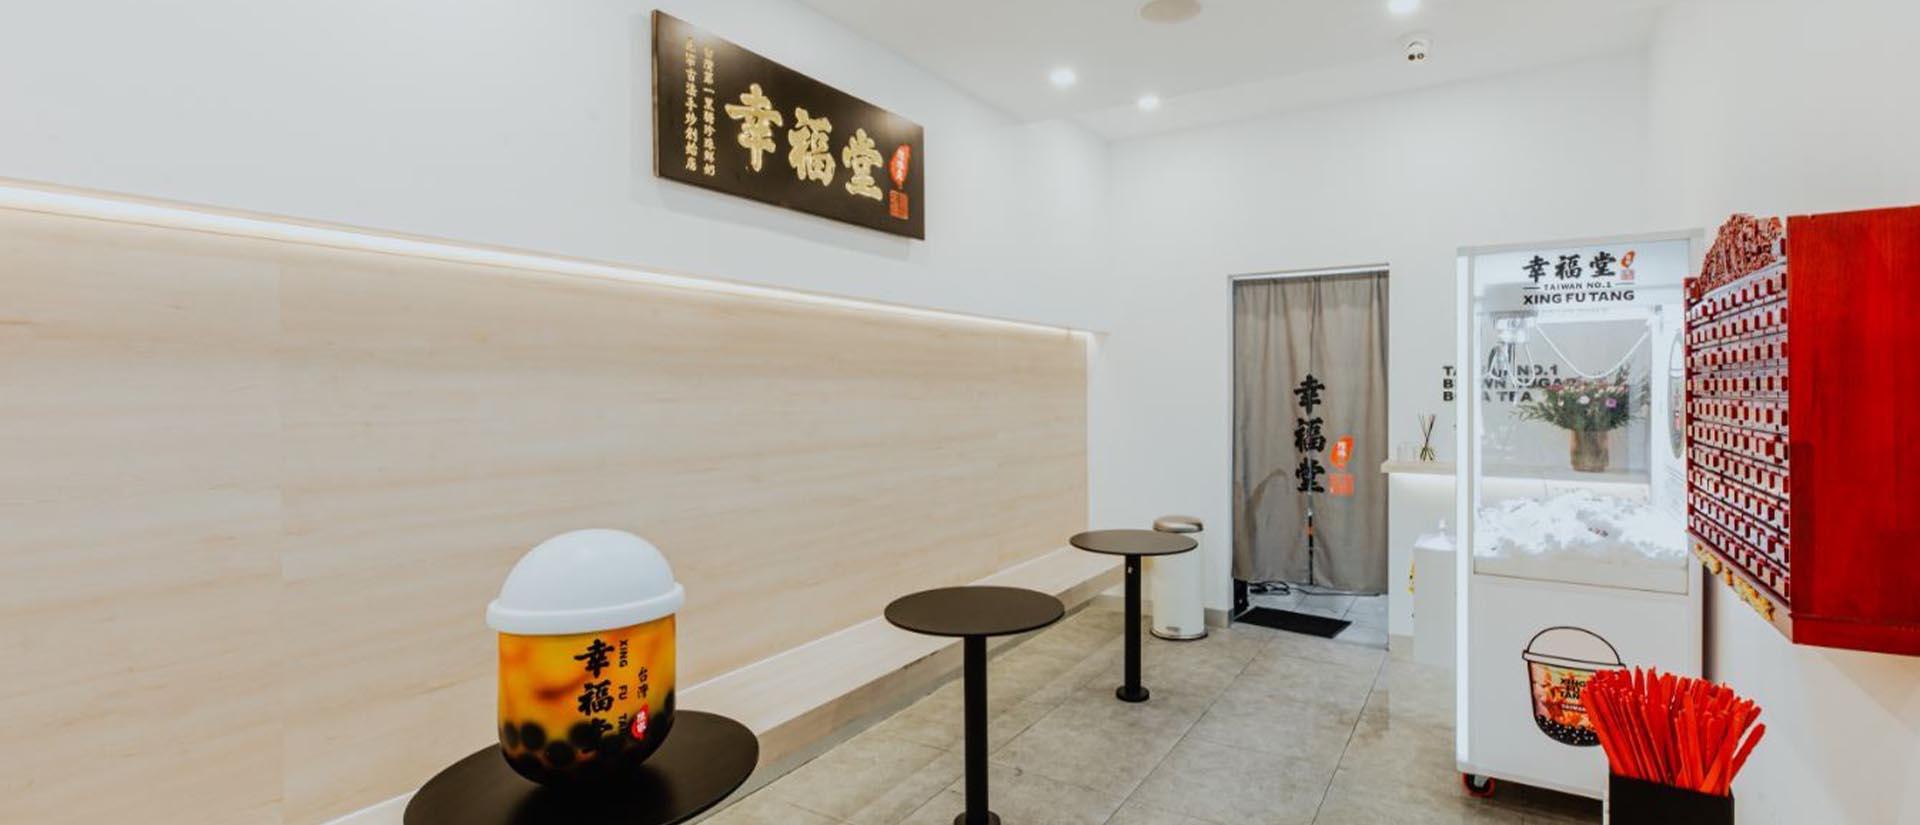 Projects-Kiosk- Xing Fu Tang 7